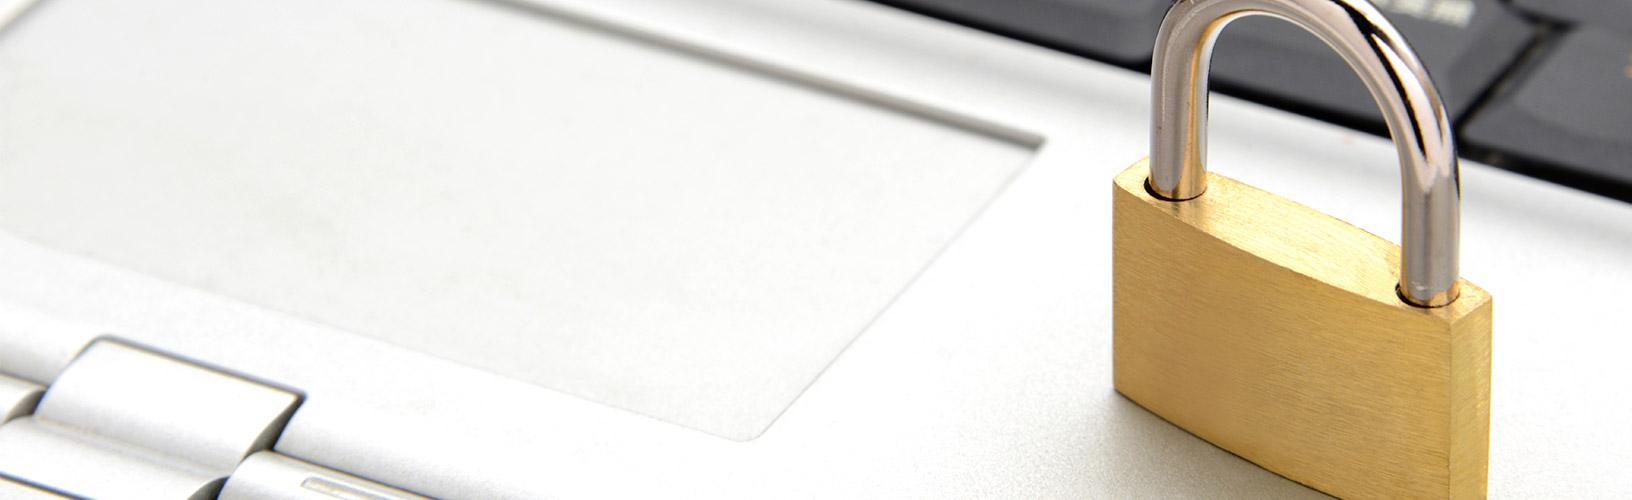 AA-Certification-Computer-Security-slider